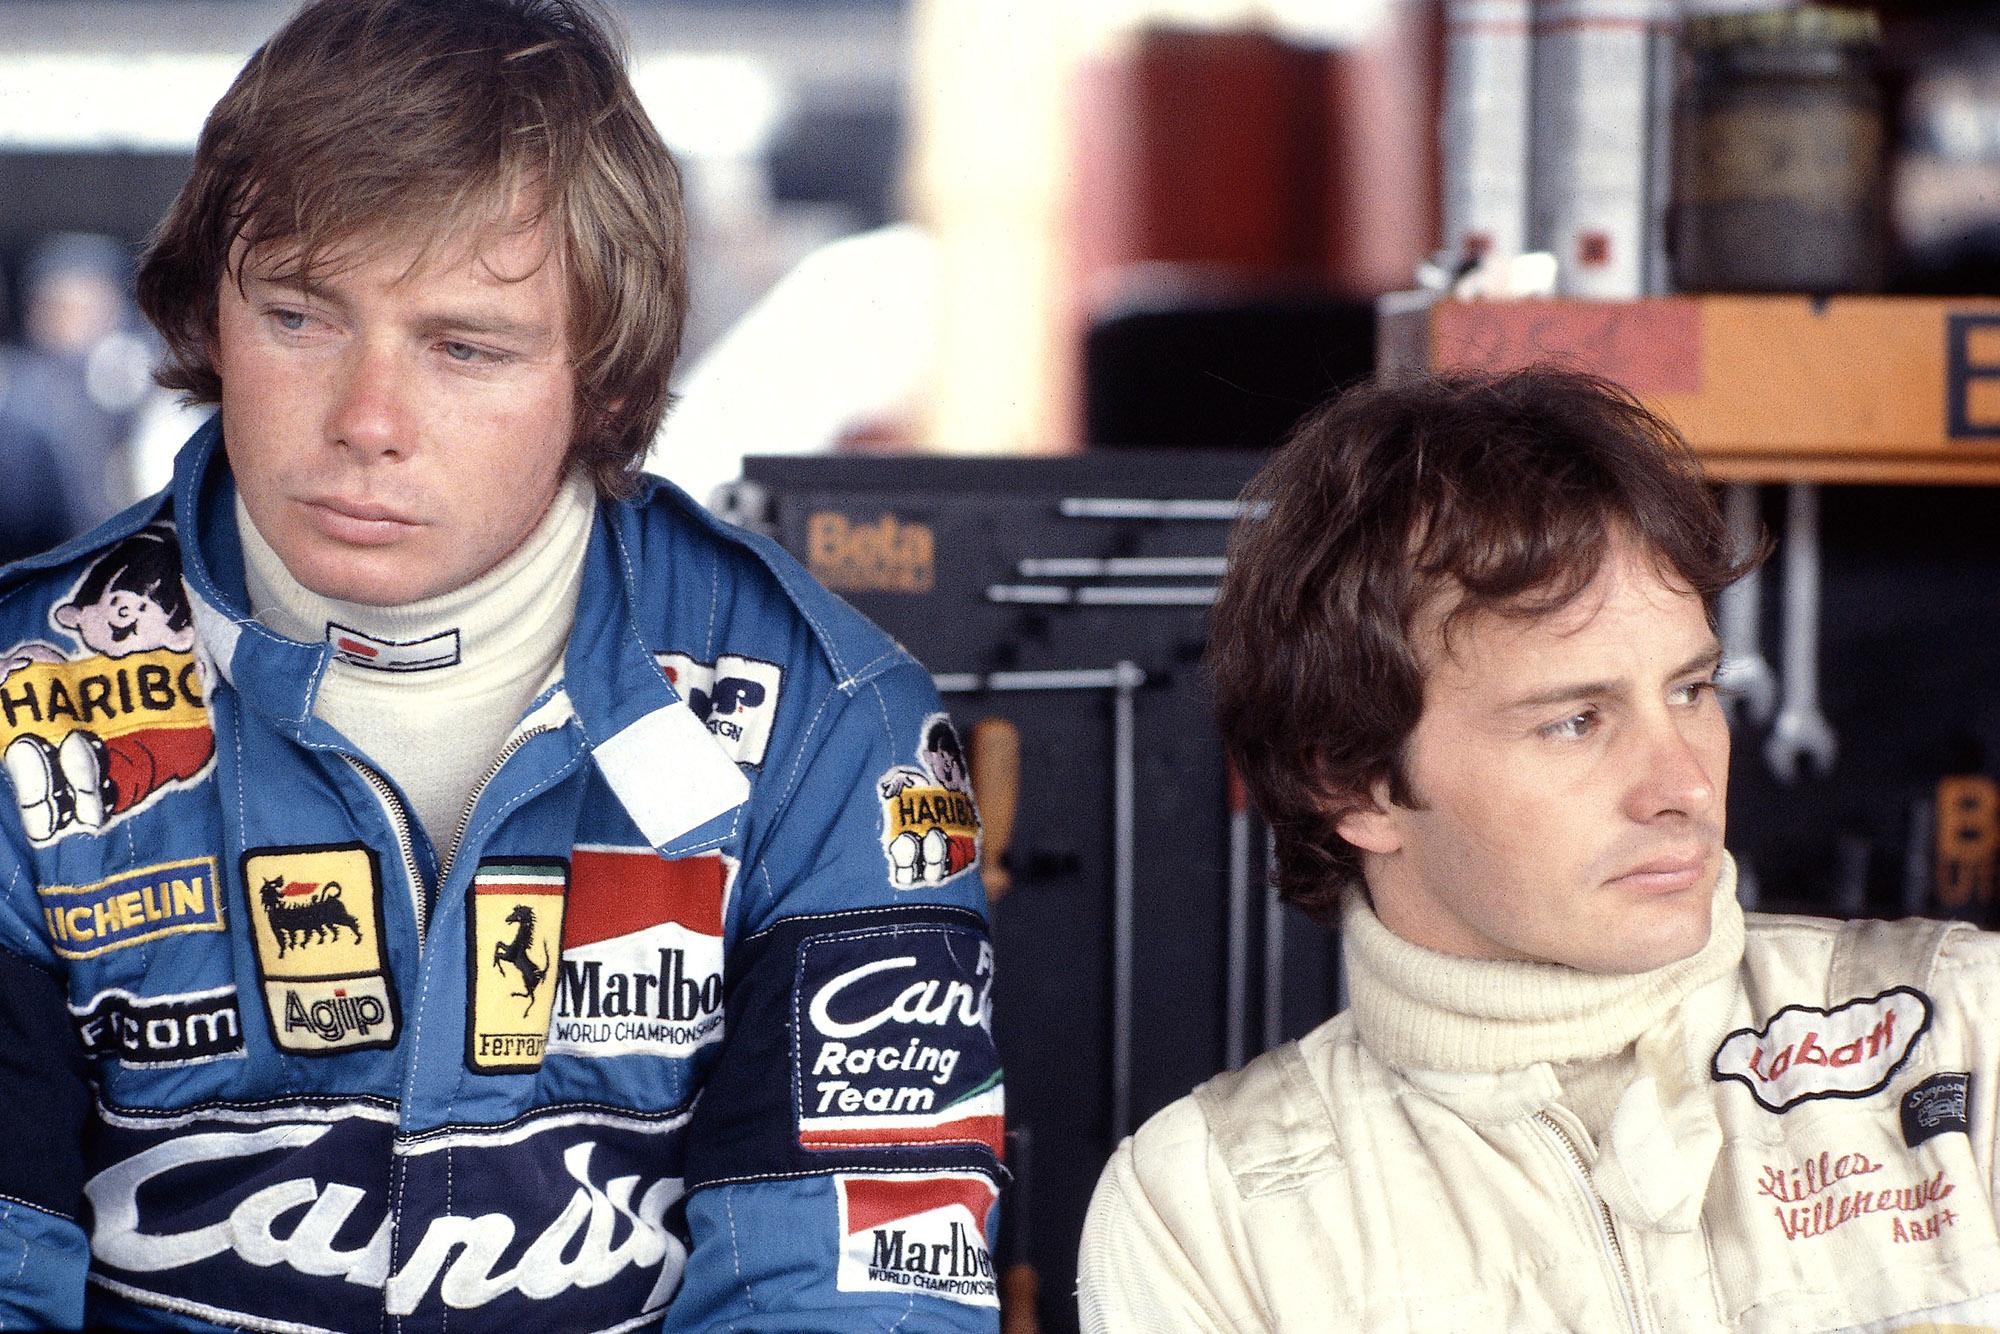 Didier Pironi next to Gilles Villeneuve in 1981